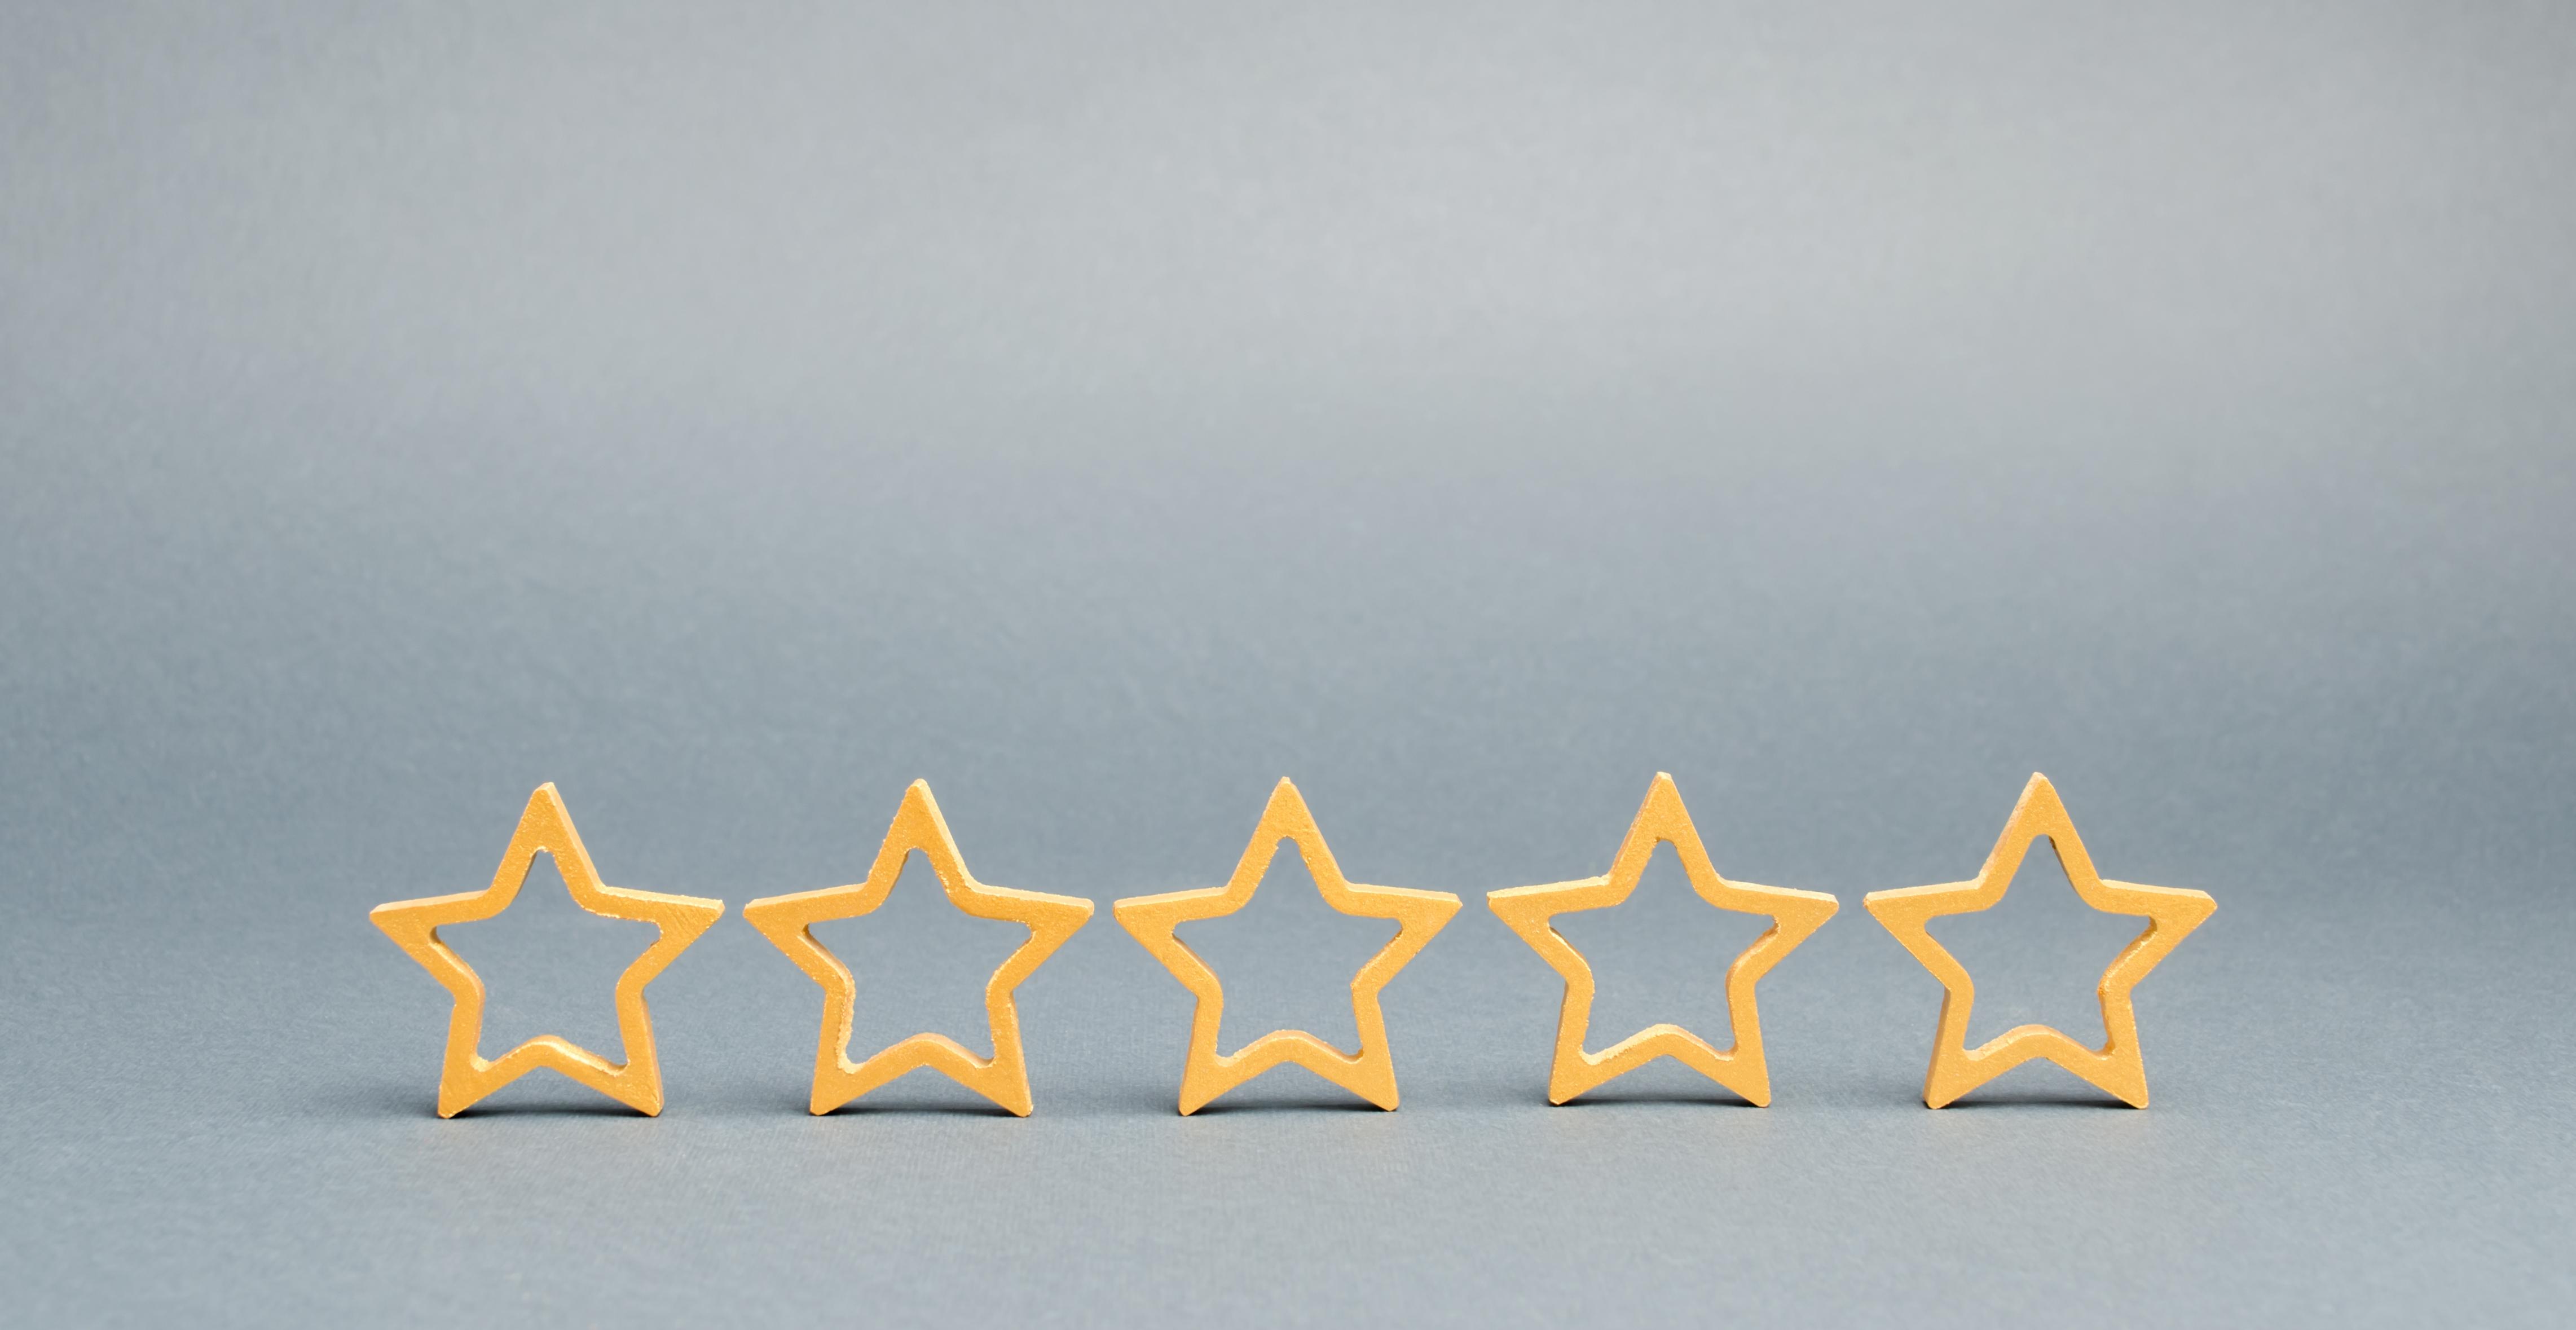 Brand Sponsors, Take Full Advantage of Your Hospitality Perks